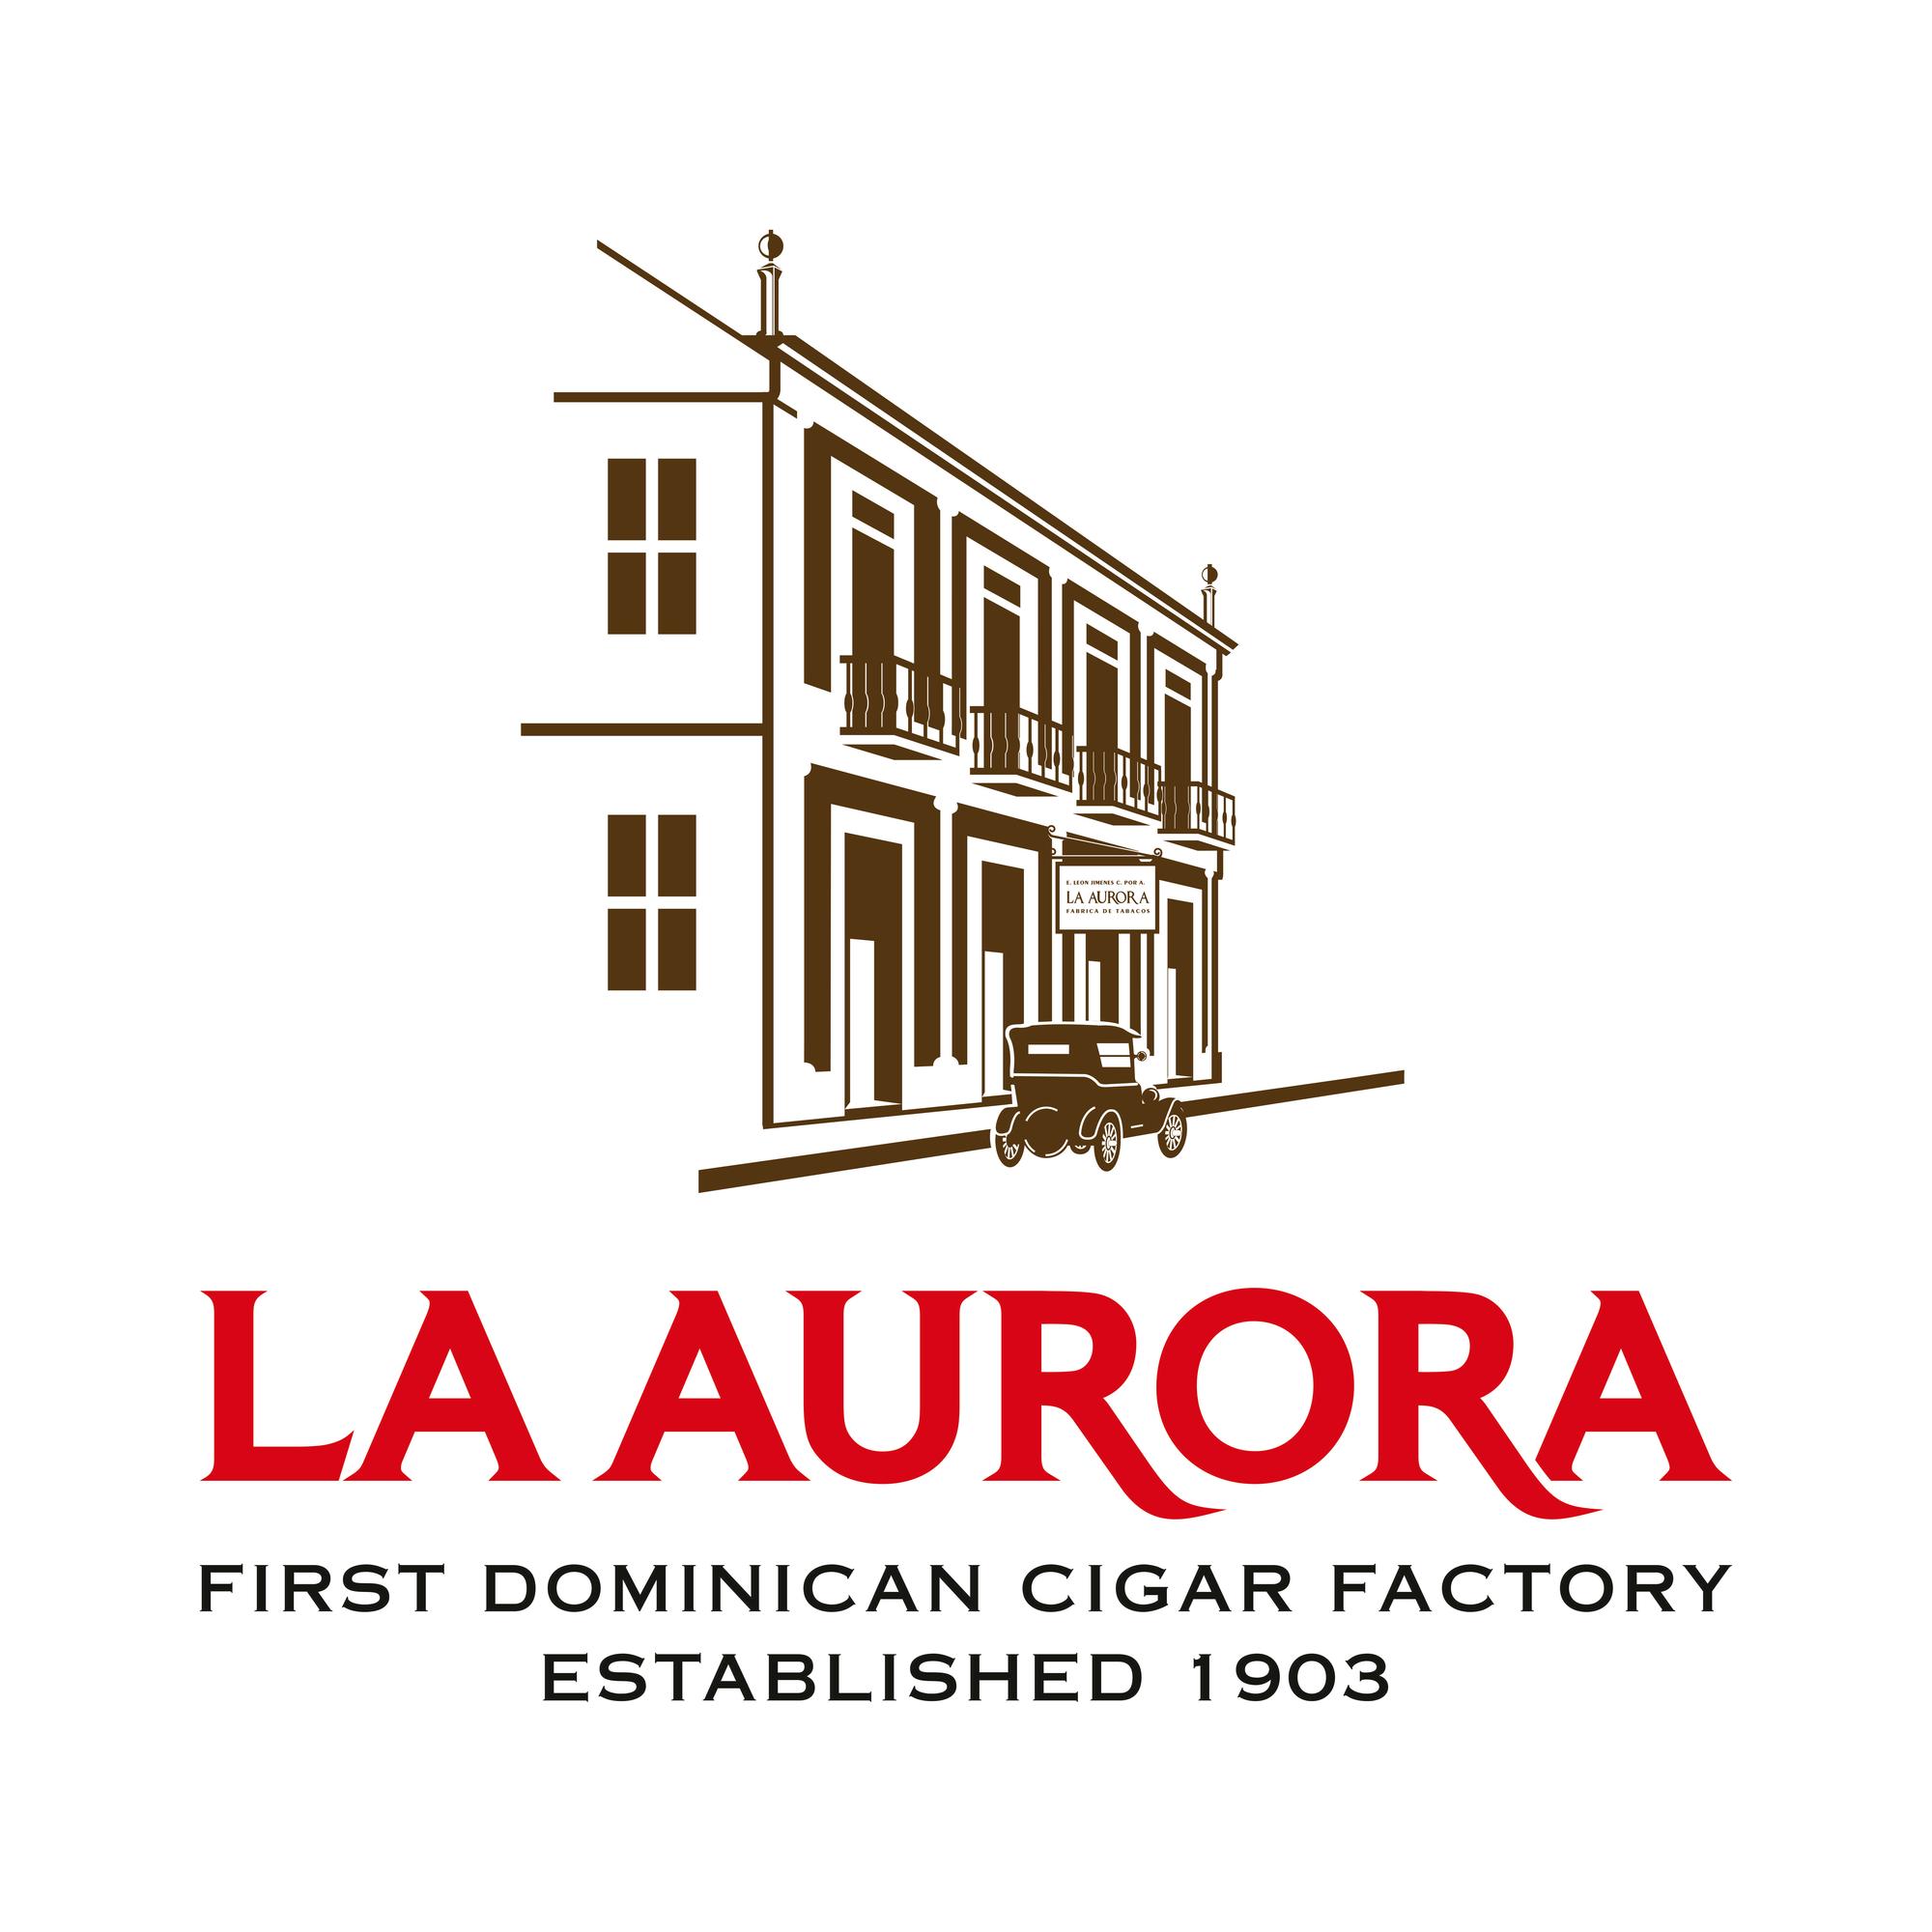 La Aurora Zigarrenmarke